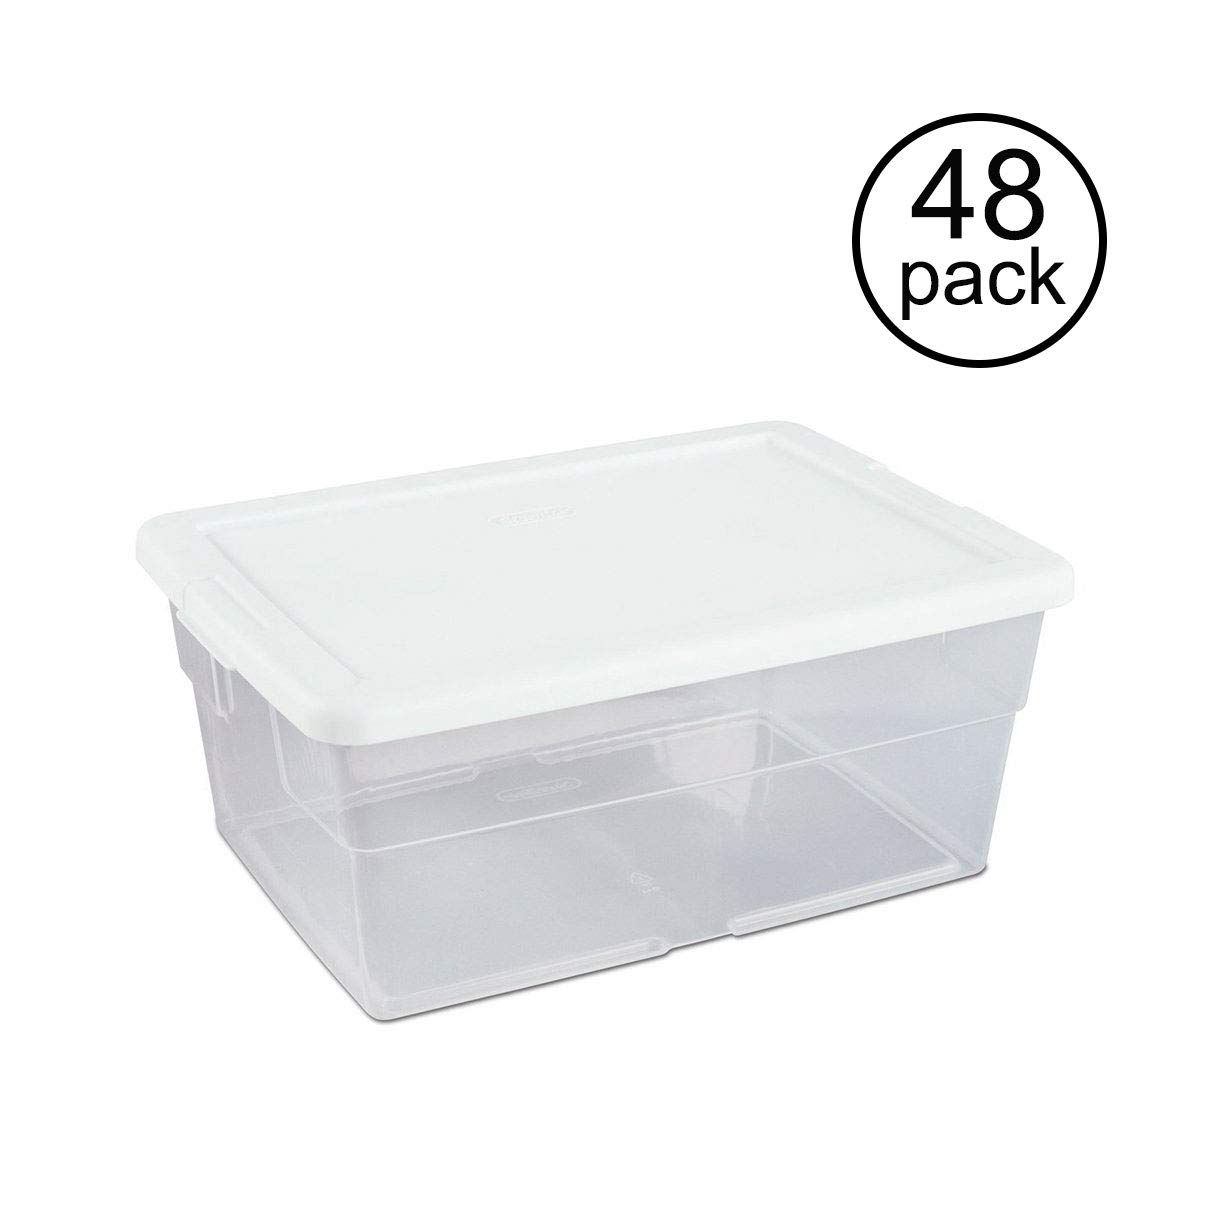 Sterilite 16 Quart Clear Stacking Closet Storage Box Container Tub (48 Pack)